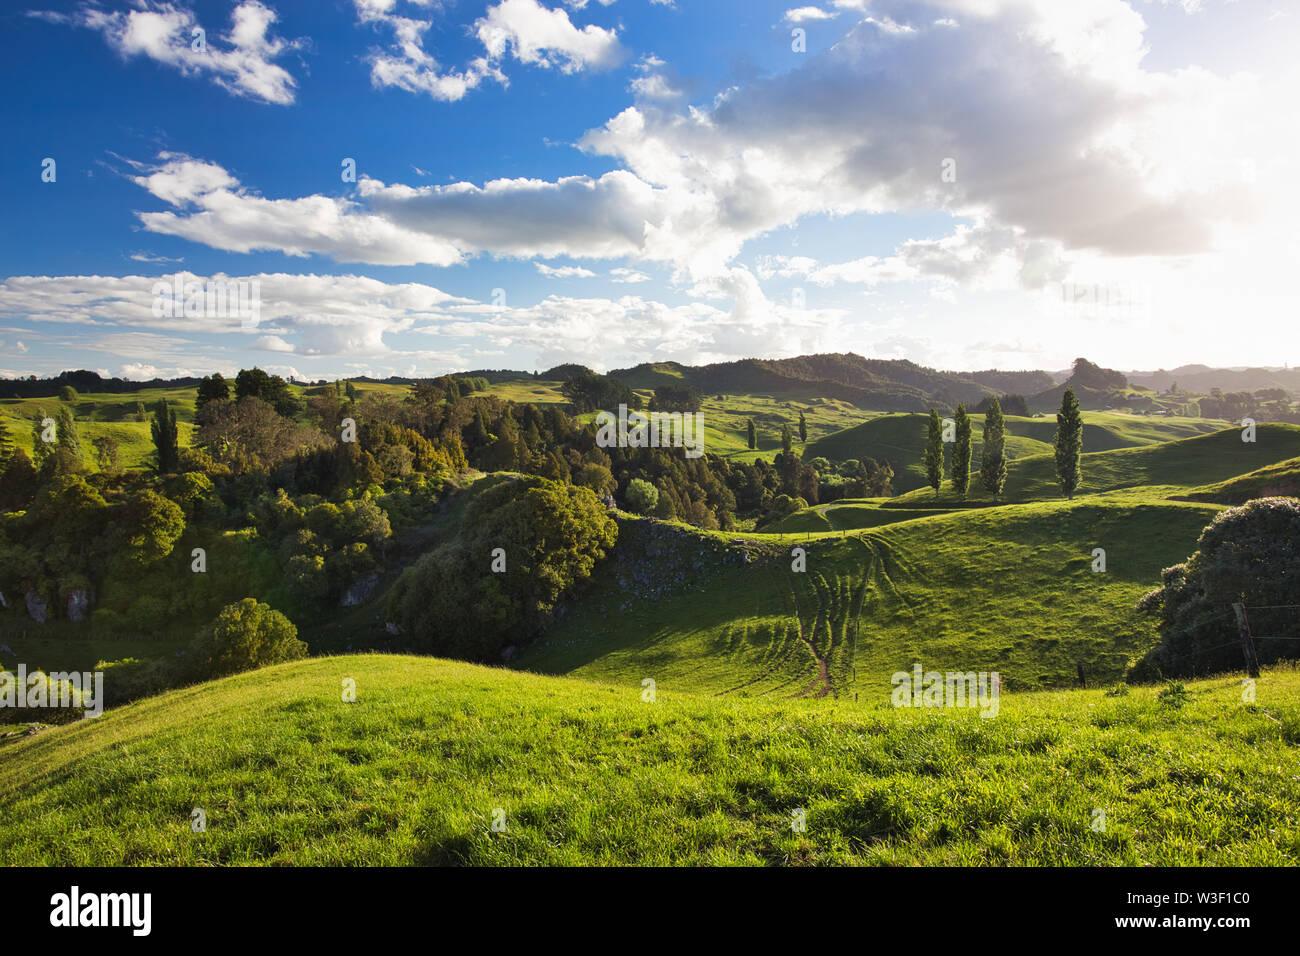 New Zealand Countryside Scenery, Waitomo Area - Stock Image